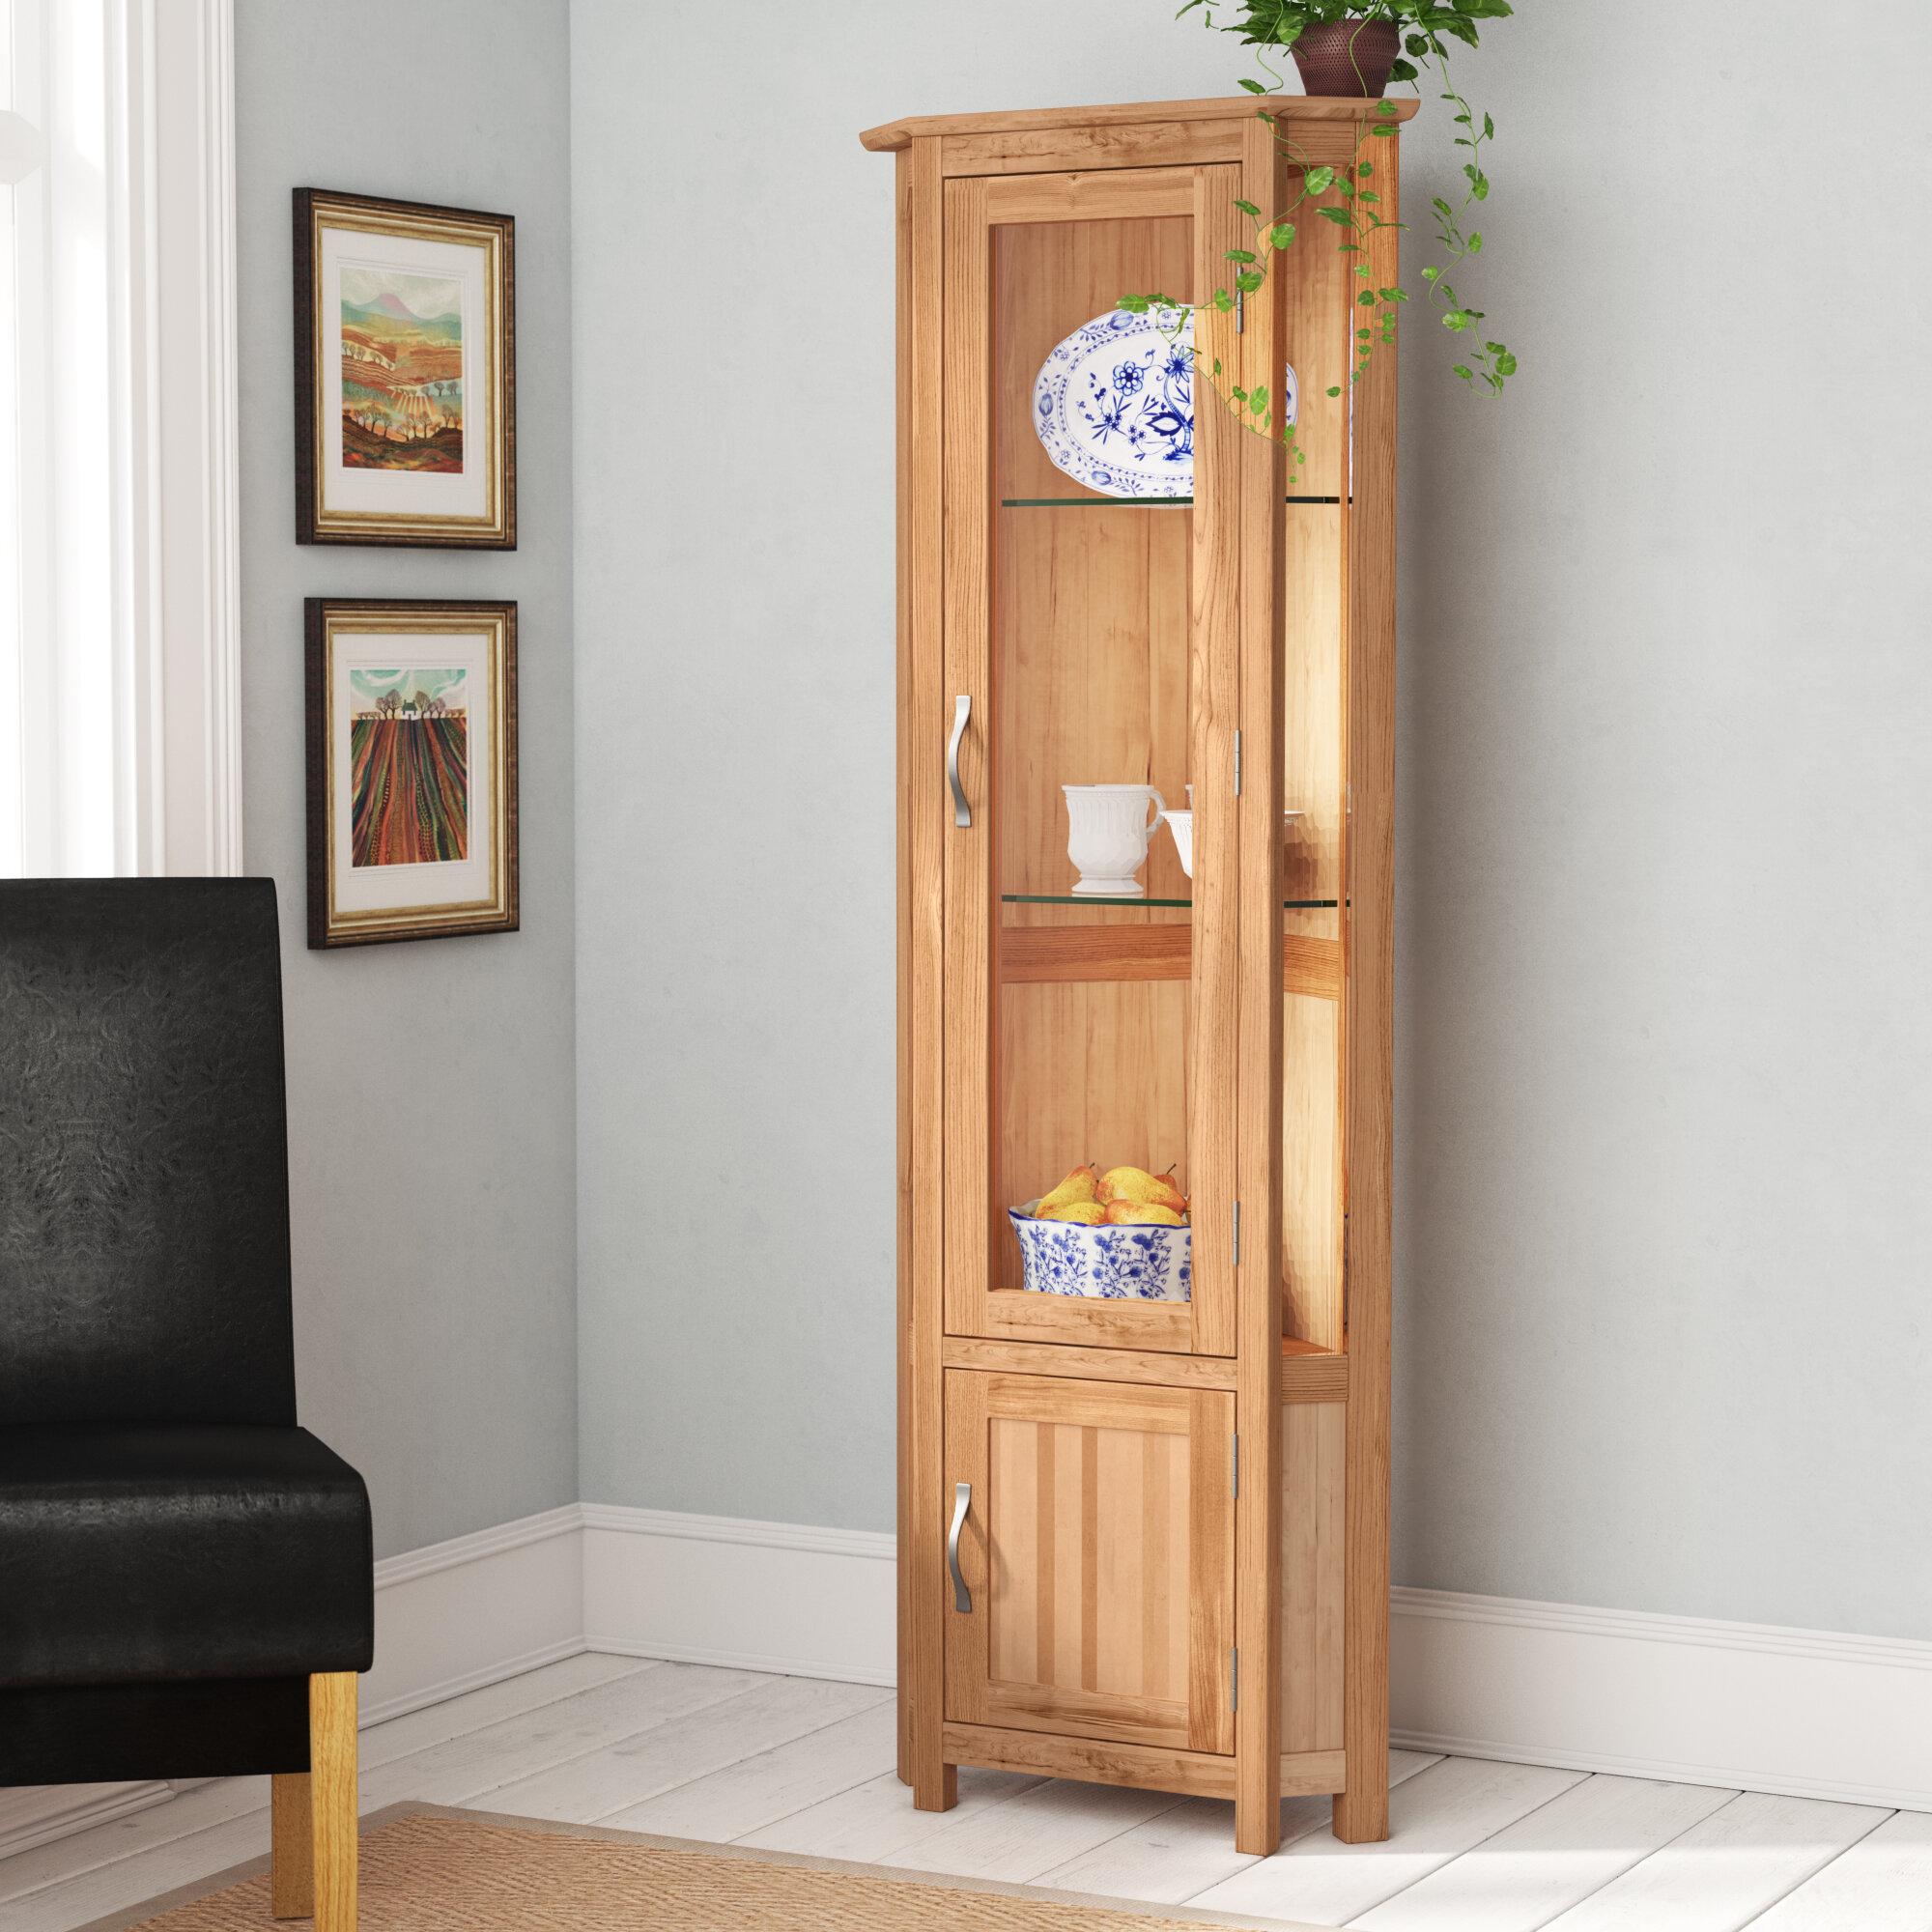 Marley Solid Oak Corner Display Cabinet